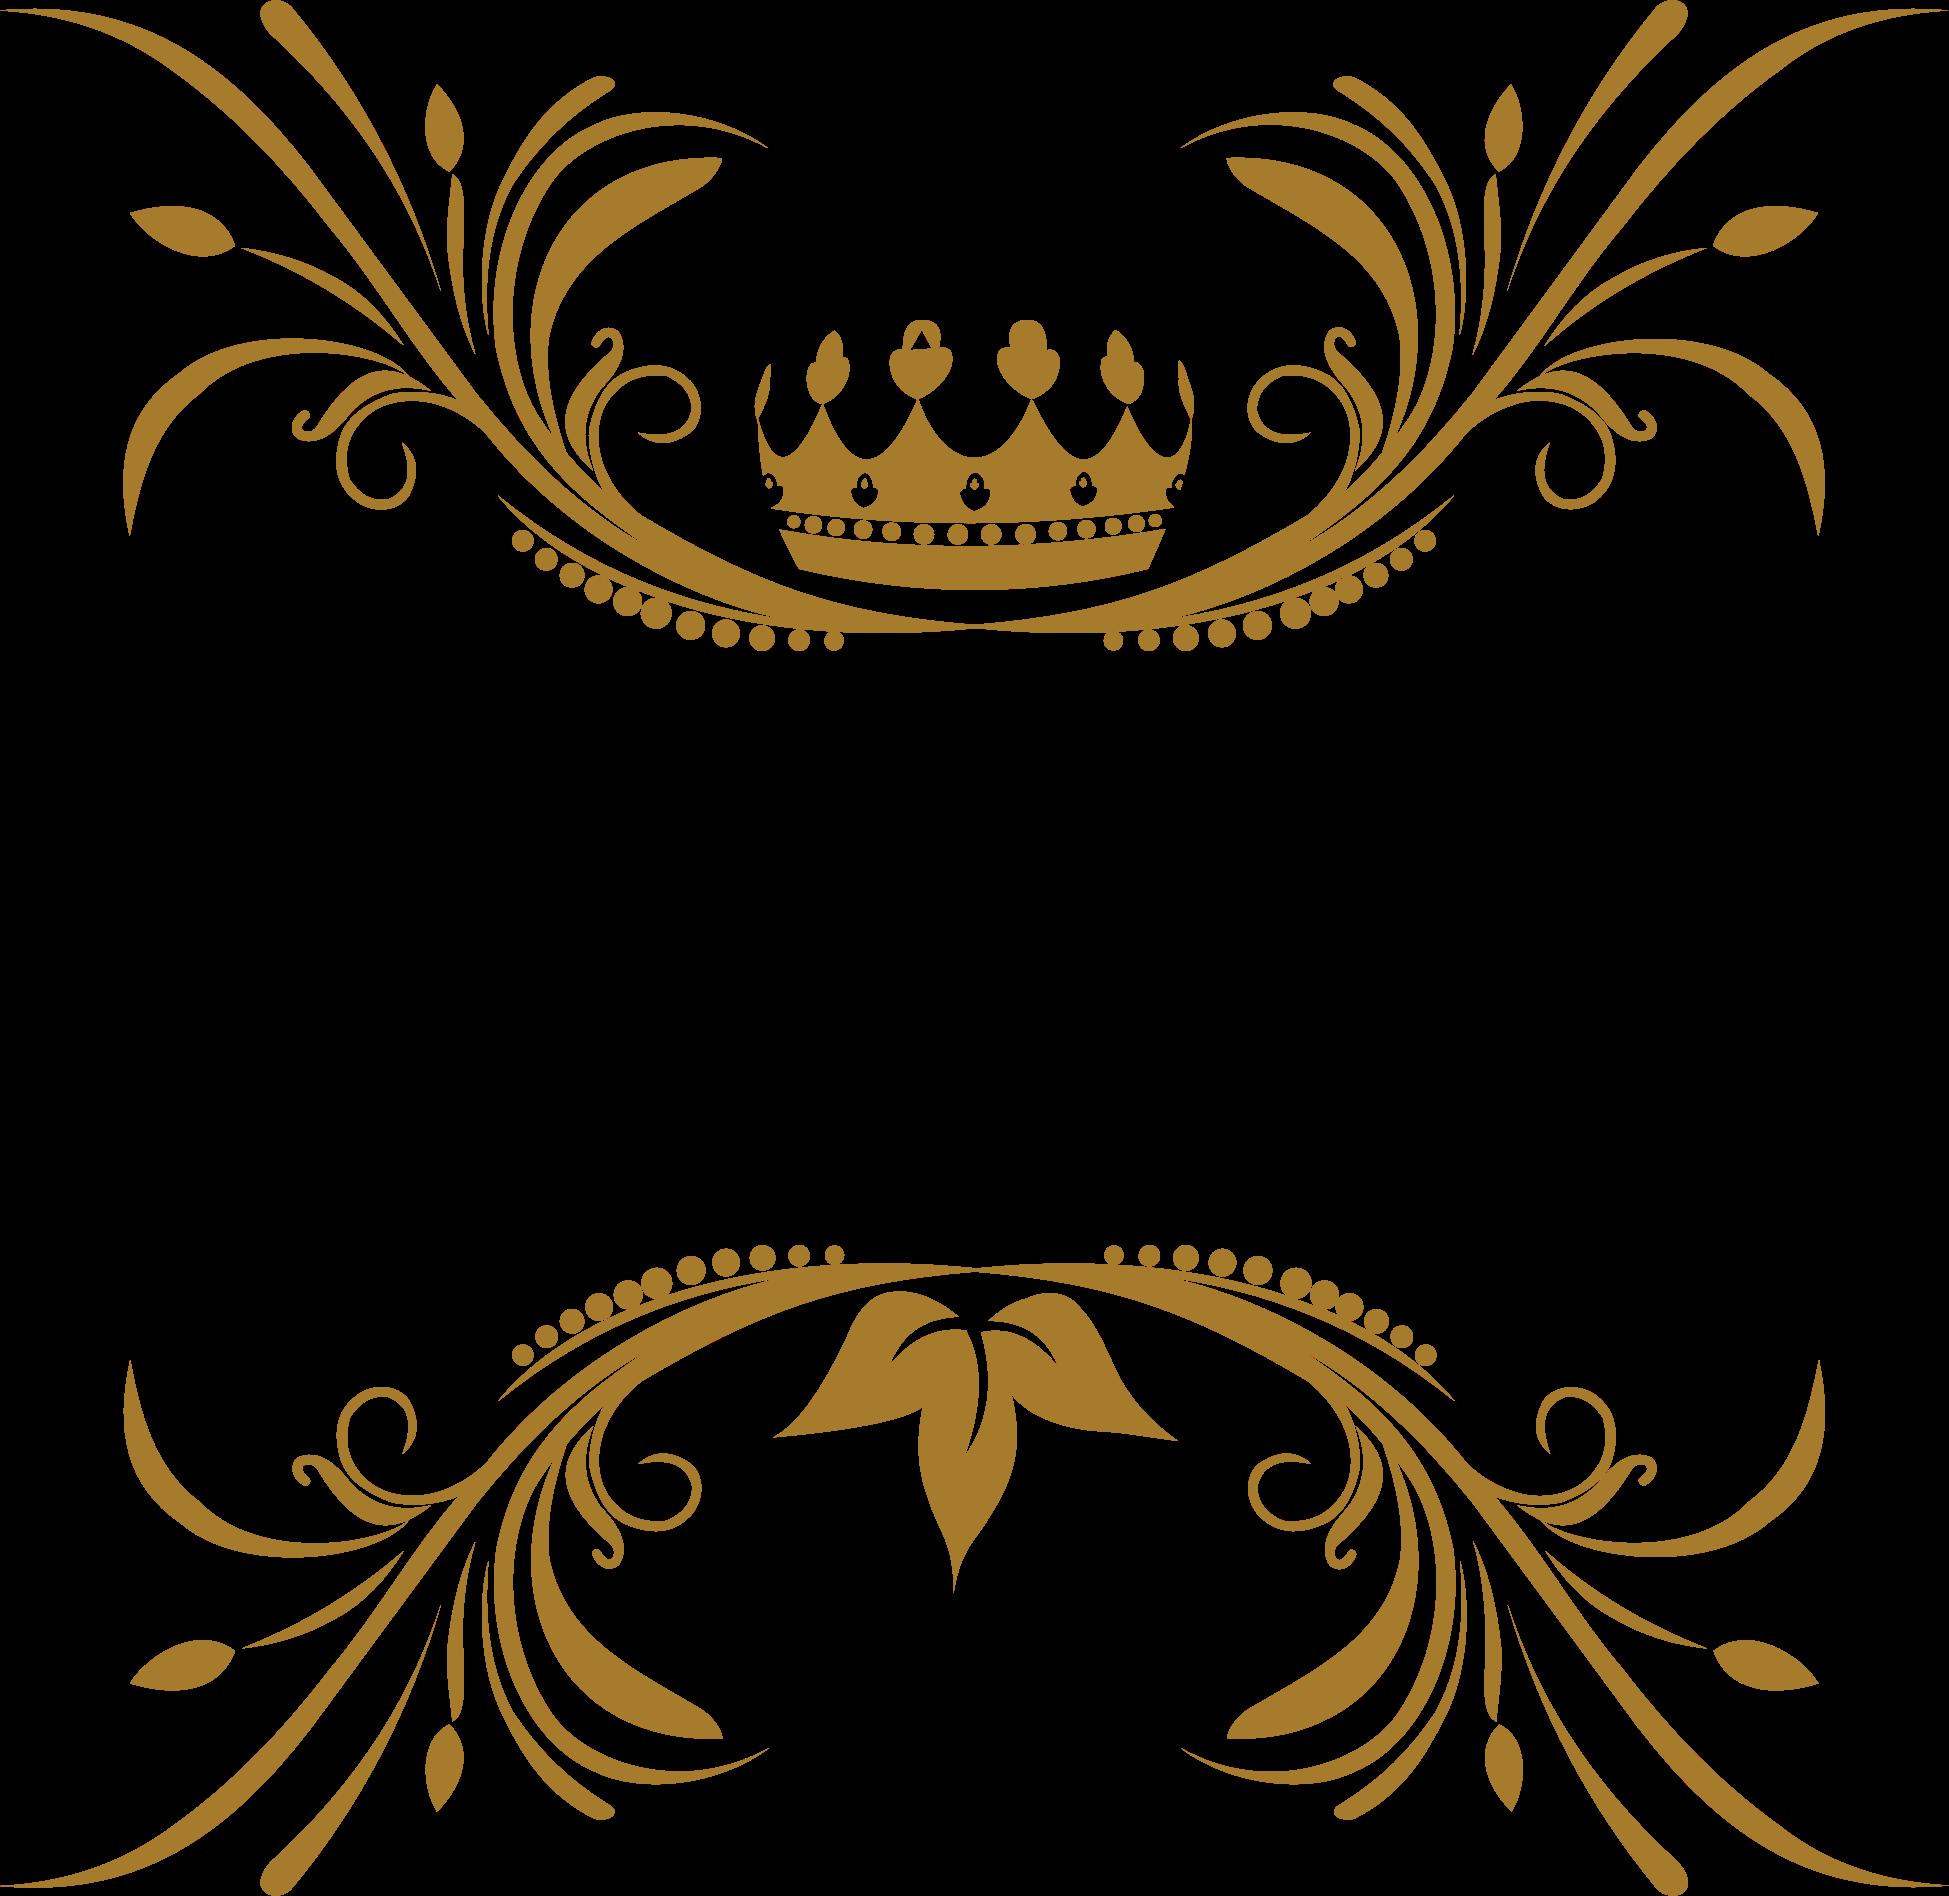 Clipart Crown Flourish No Background